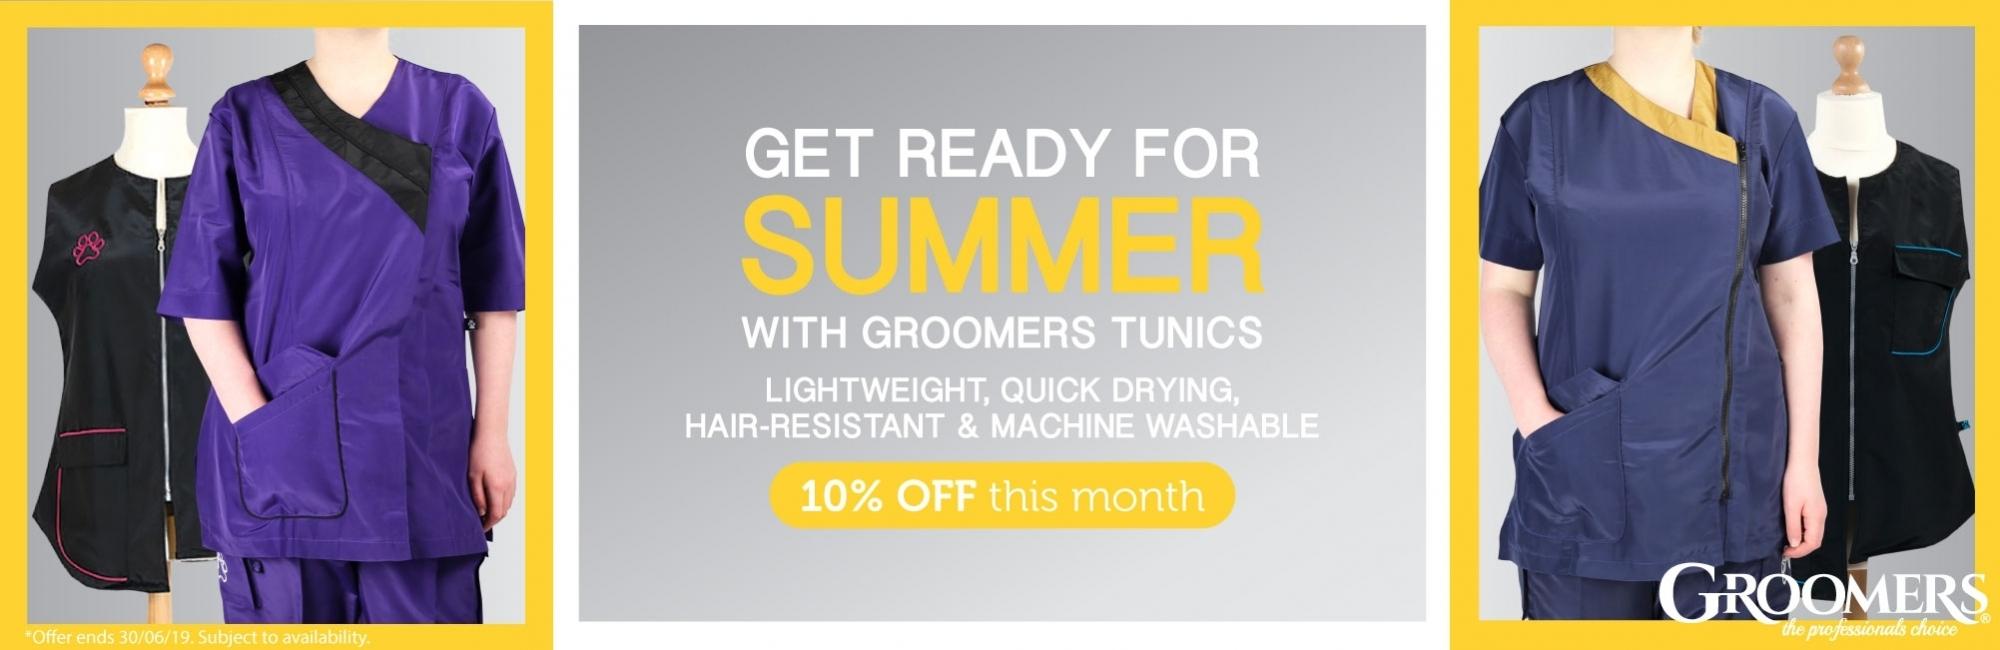 10% Off Groomers Tunics